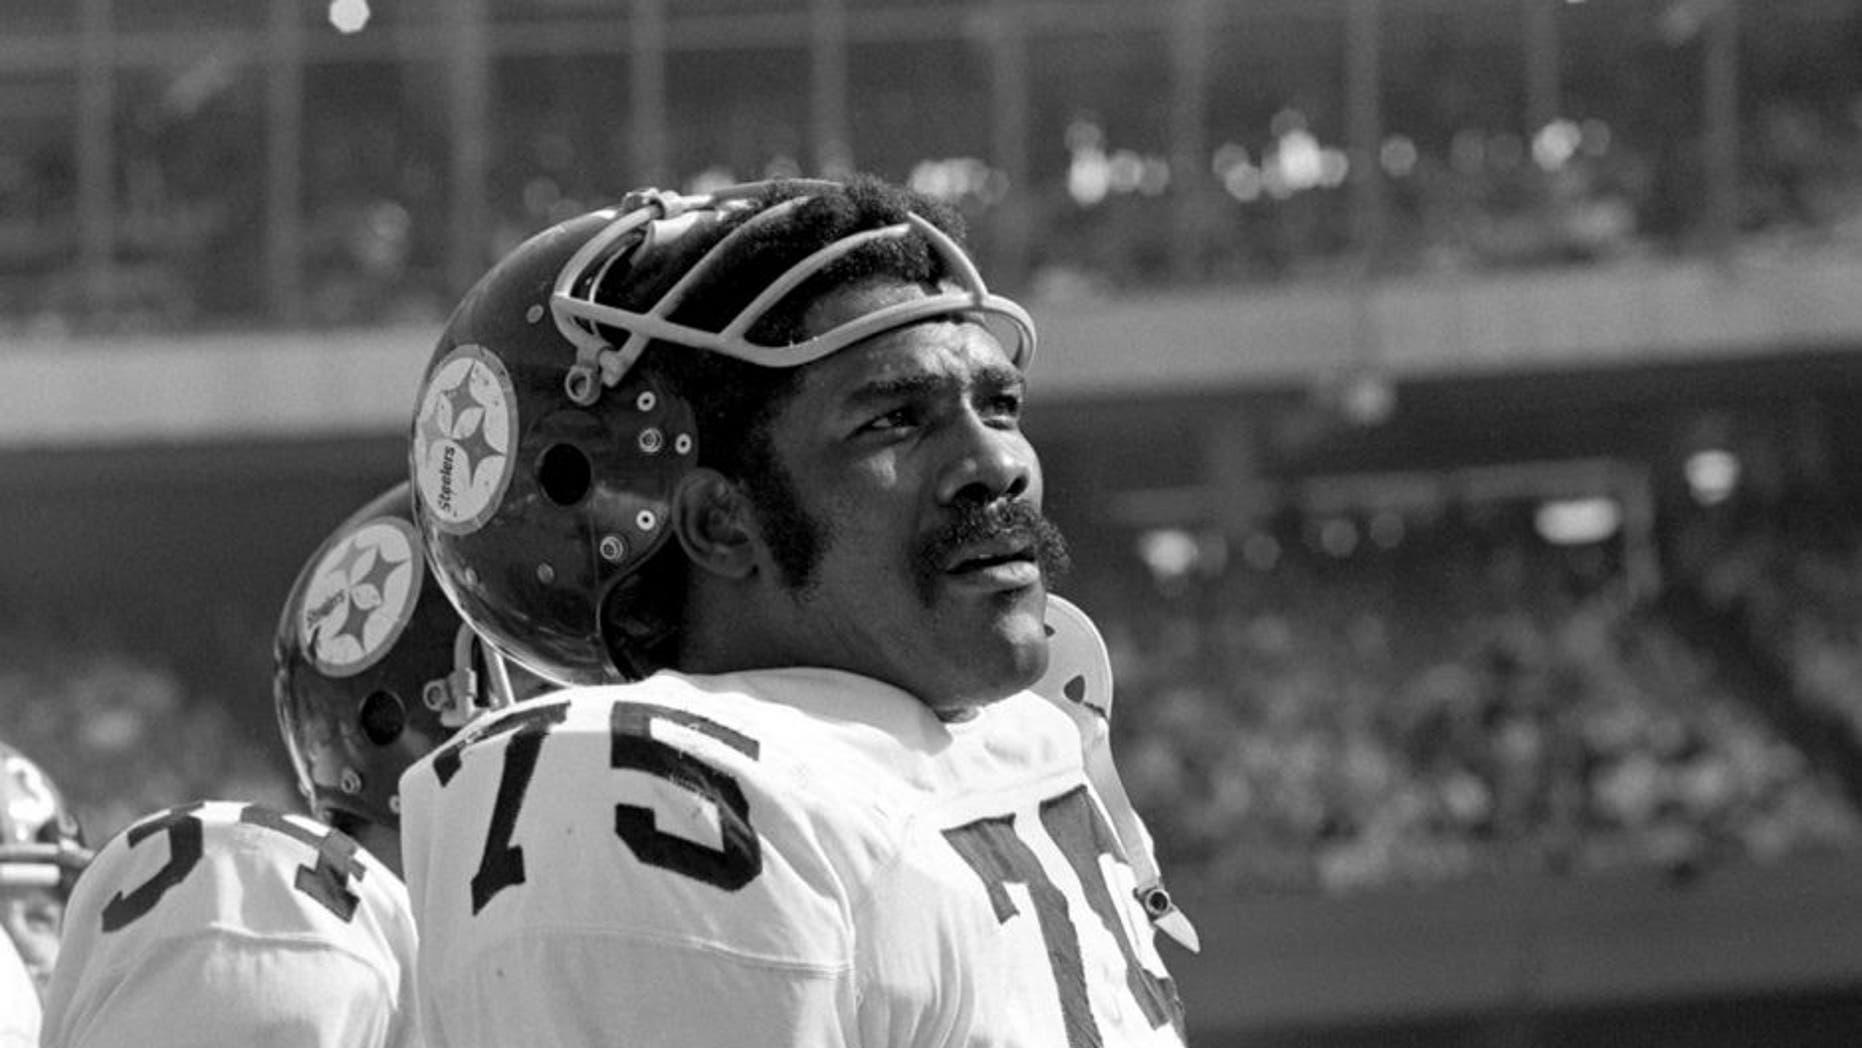 CINCINNATI - NOVEMBER 2: Defensive lineman Joe Greene #75 of the Pittsburgh Steelers on the sidelines during a game on November 2, 1975 against the Cincinnati Bengals at Riverfront Stadium in Cincinnati, Ohio. (Photo by: Diamond Image/Getty Images) *** Local Caption *** Joe Greene